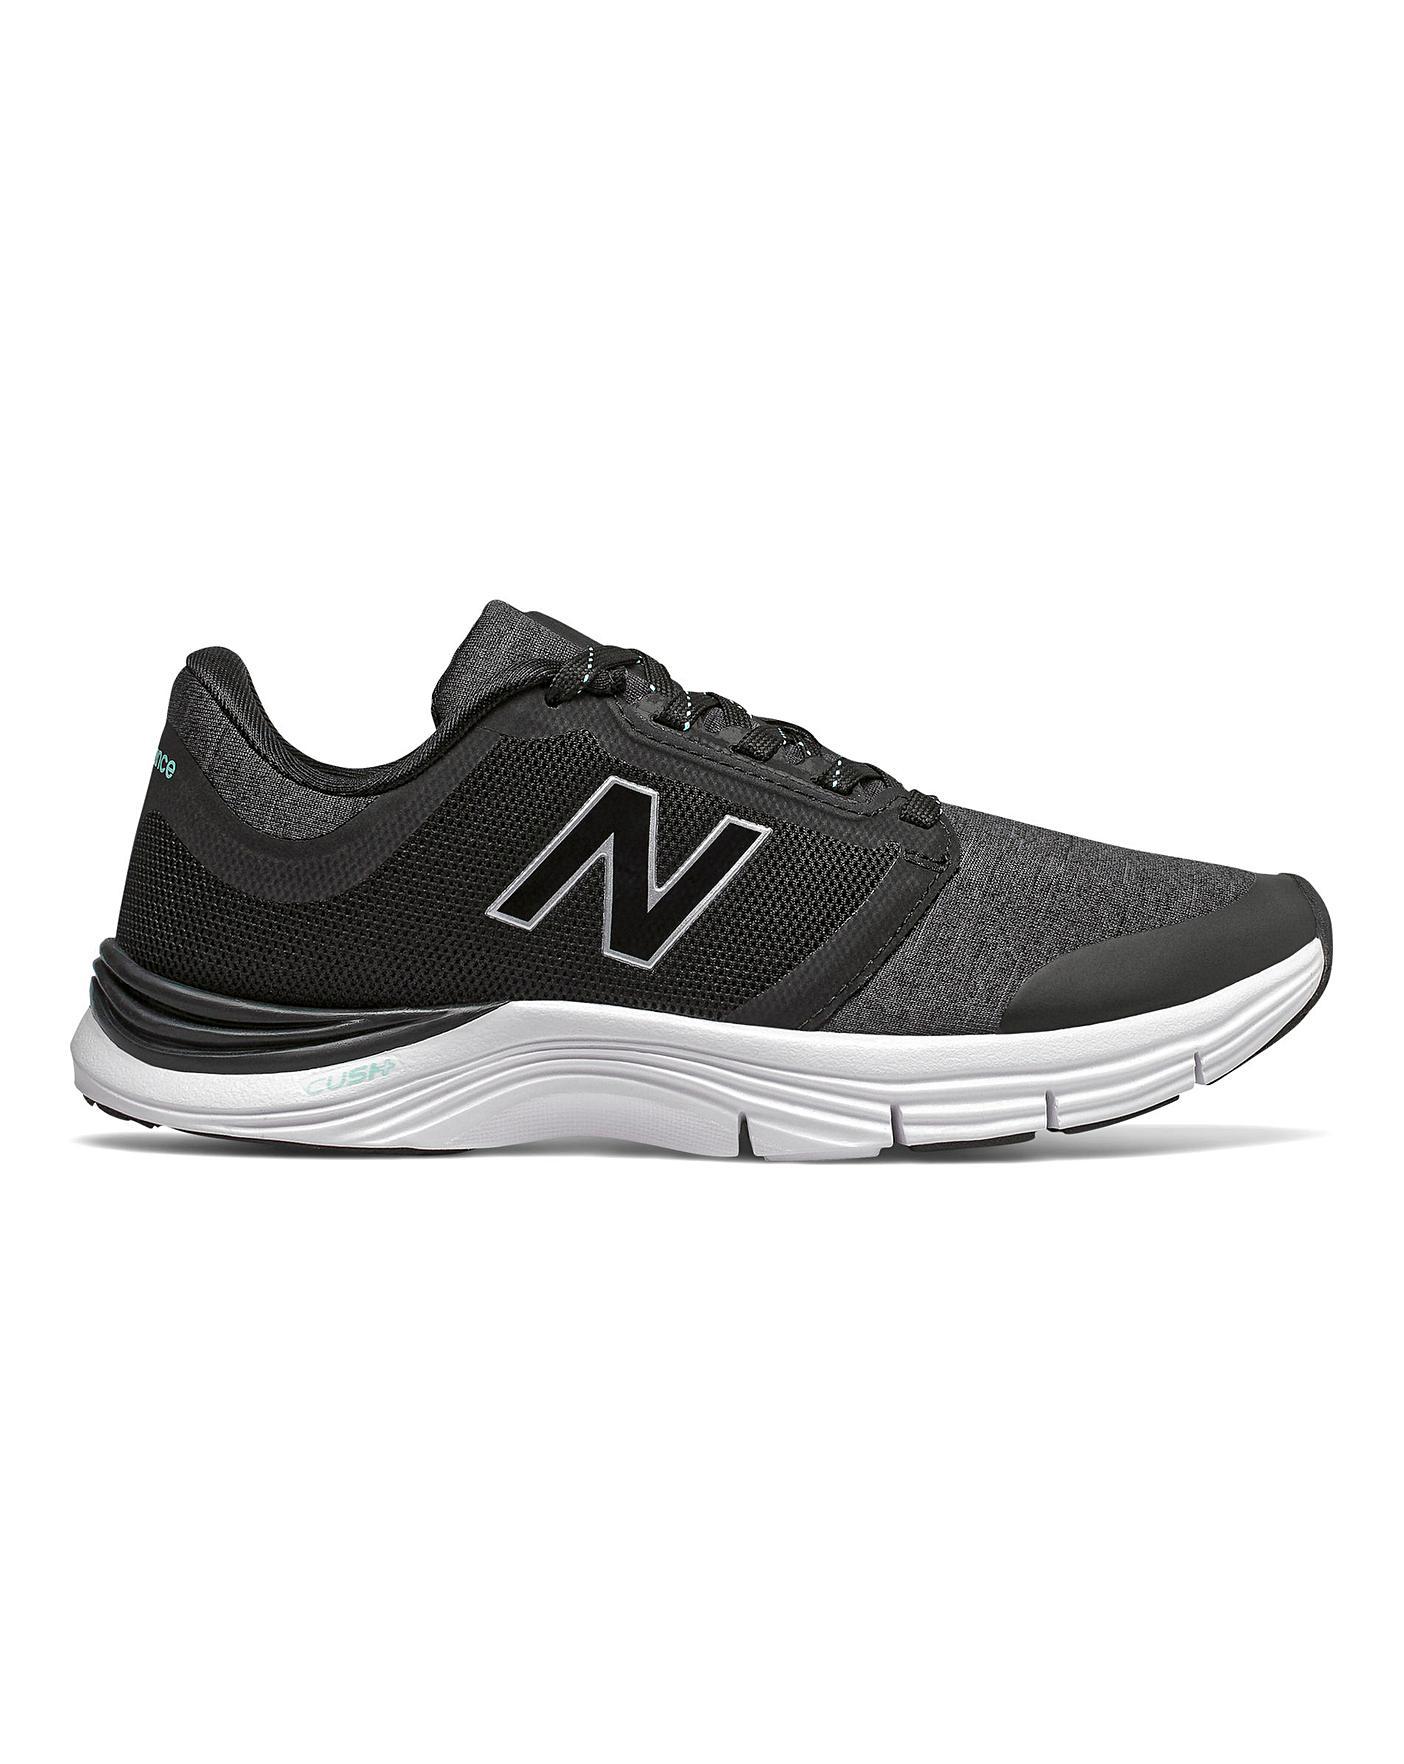 New Balance 715 Trainers | Marisota